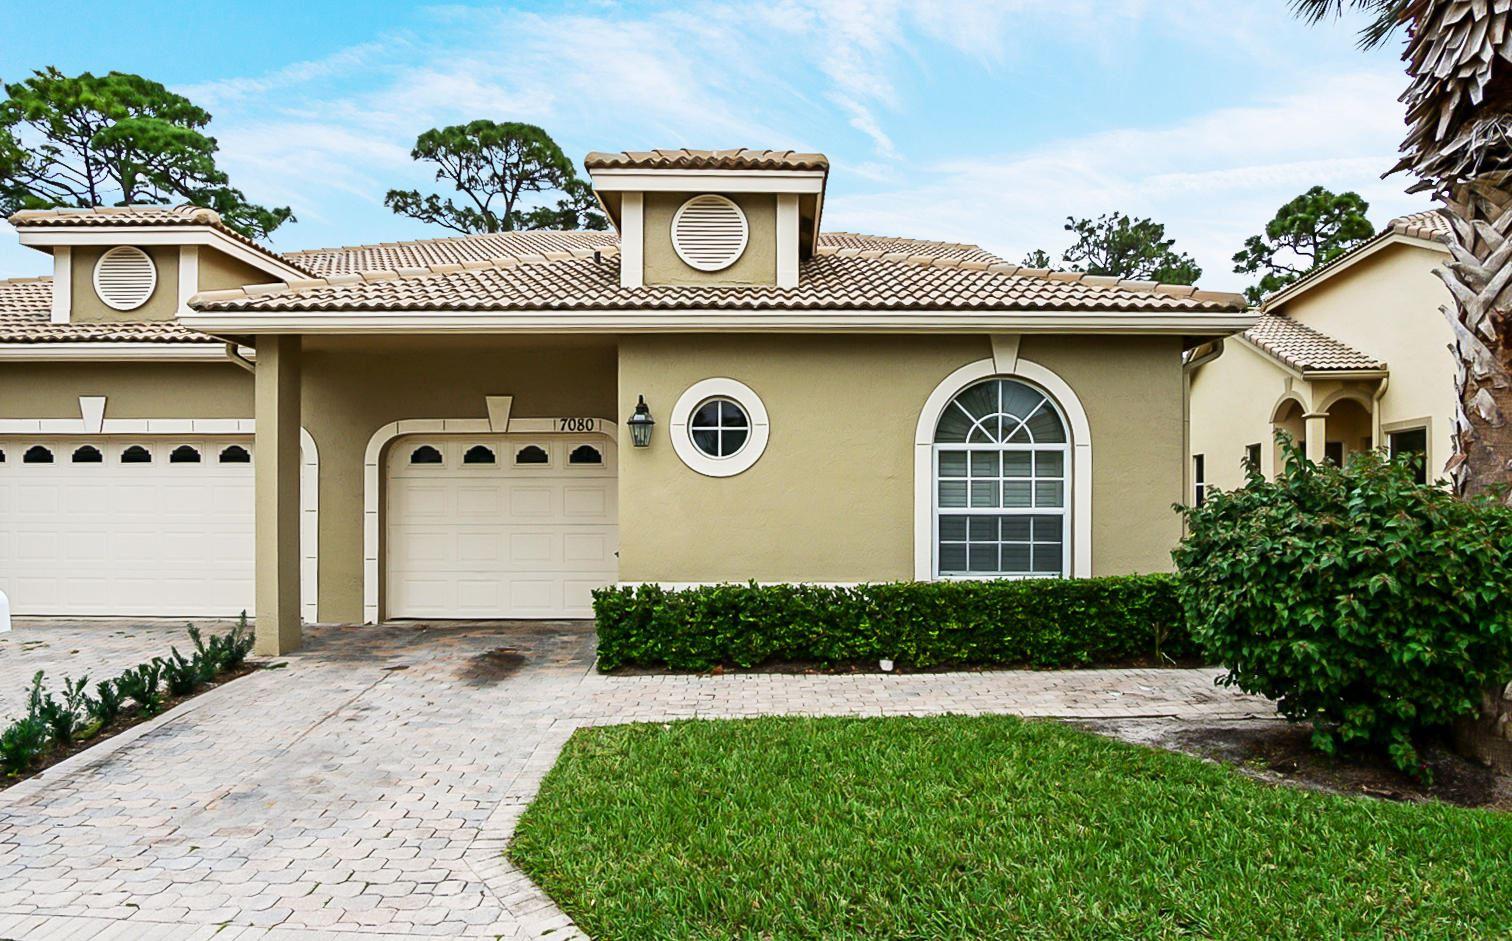 7080 Torrey Pines Circle, Port Saint Lucie, FL 34986 - #: RX-10647896